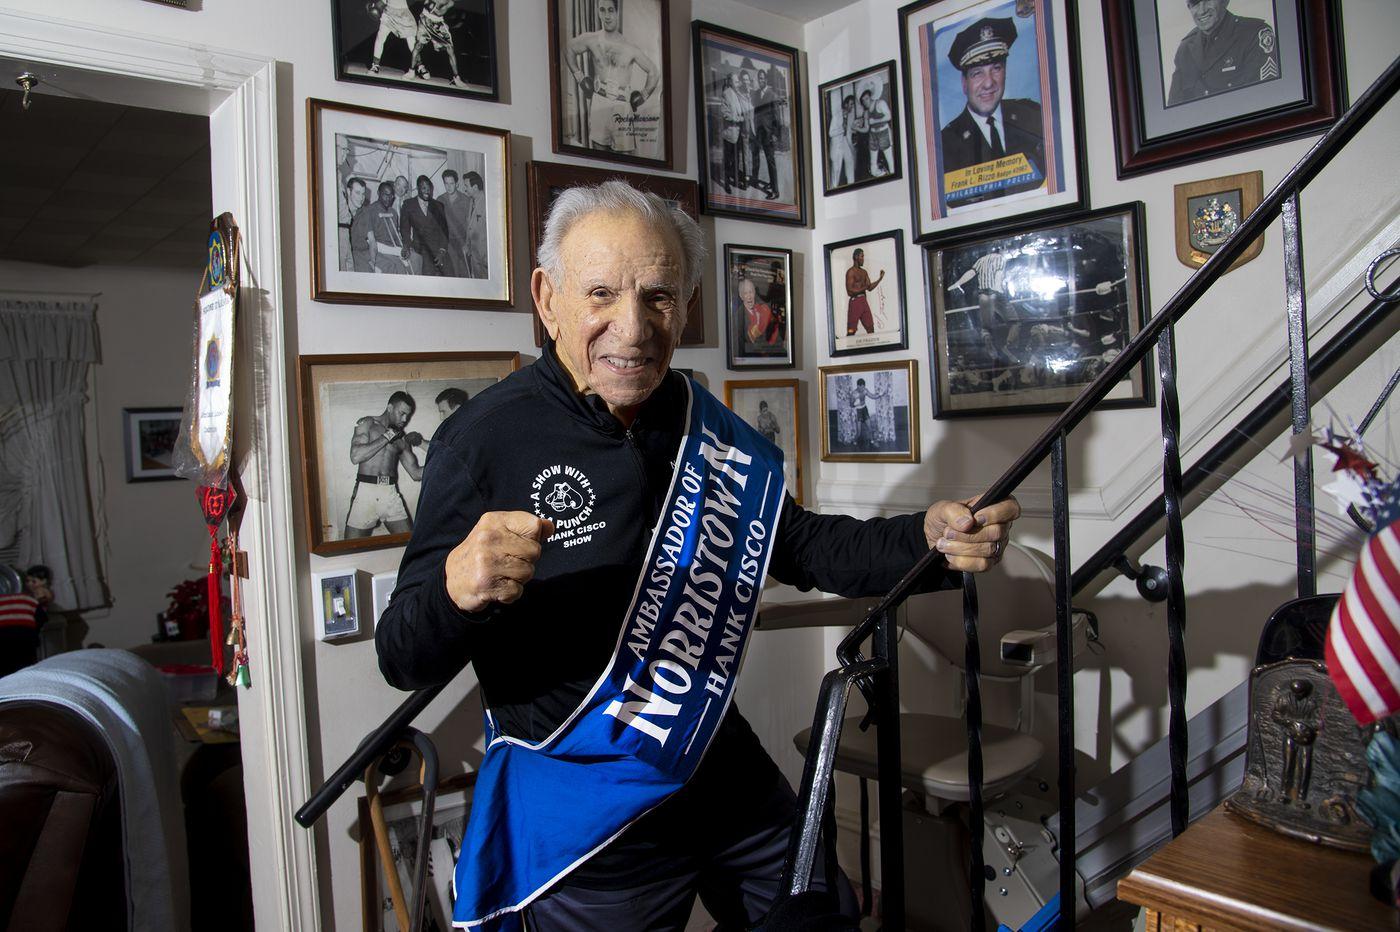 Hank Cisco, 96, Norristown's goodwill ambassador, dies